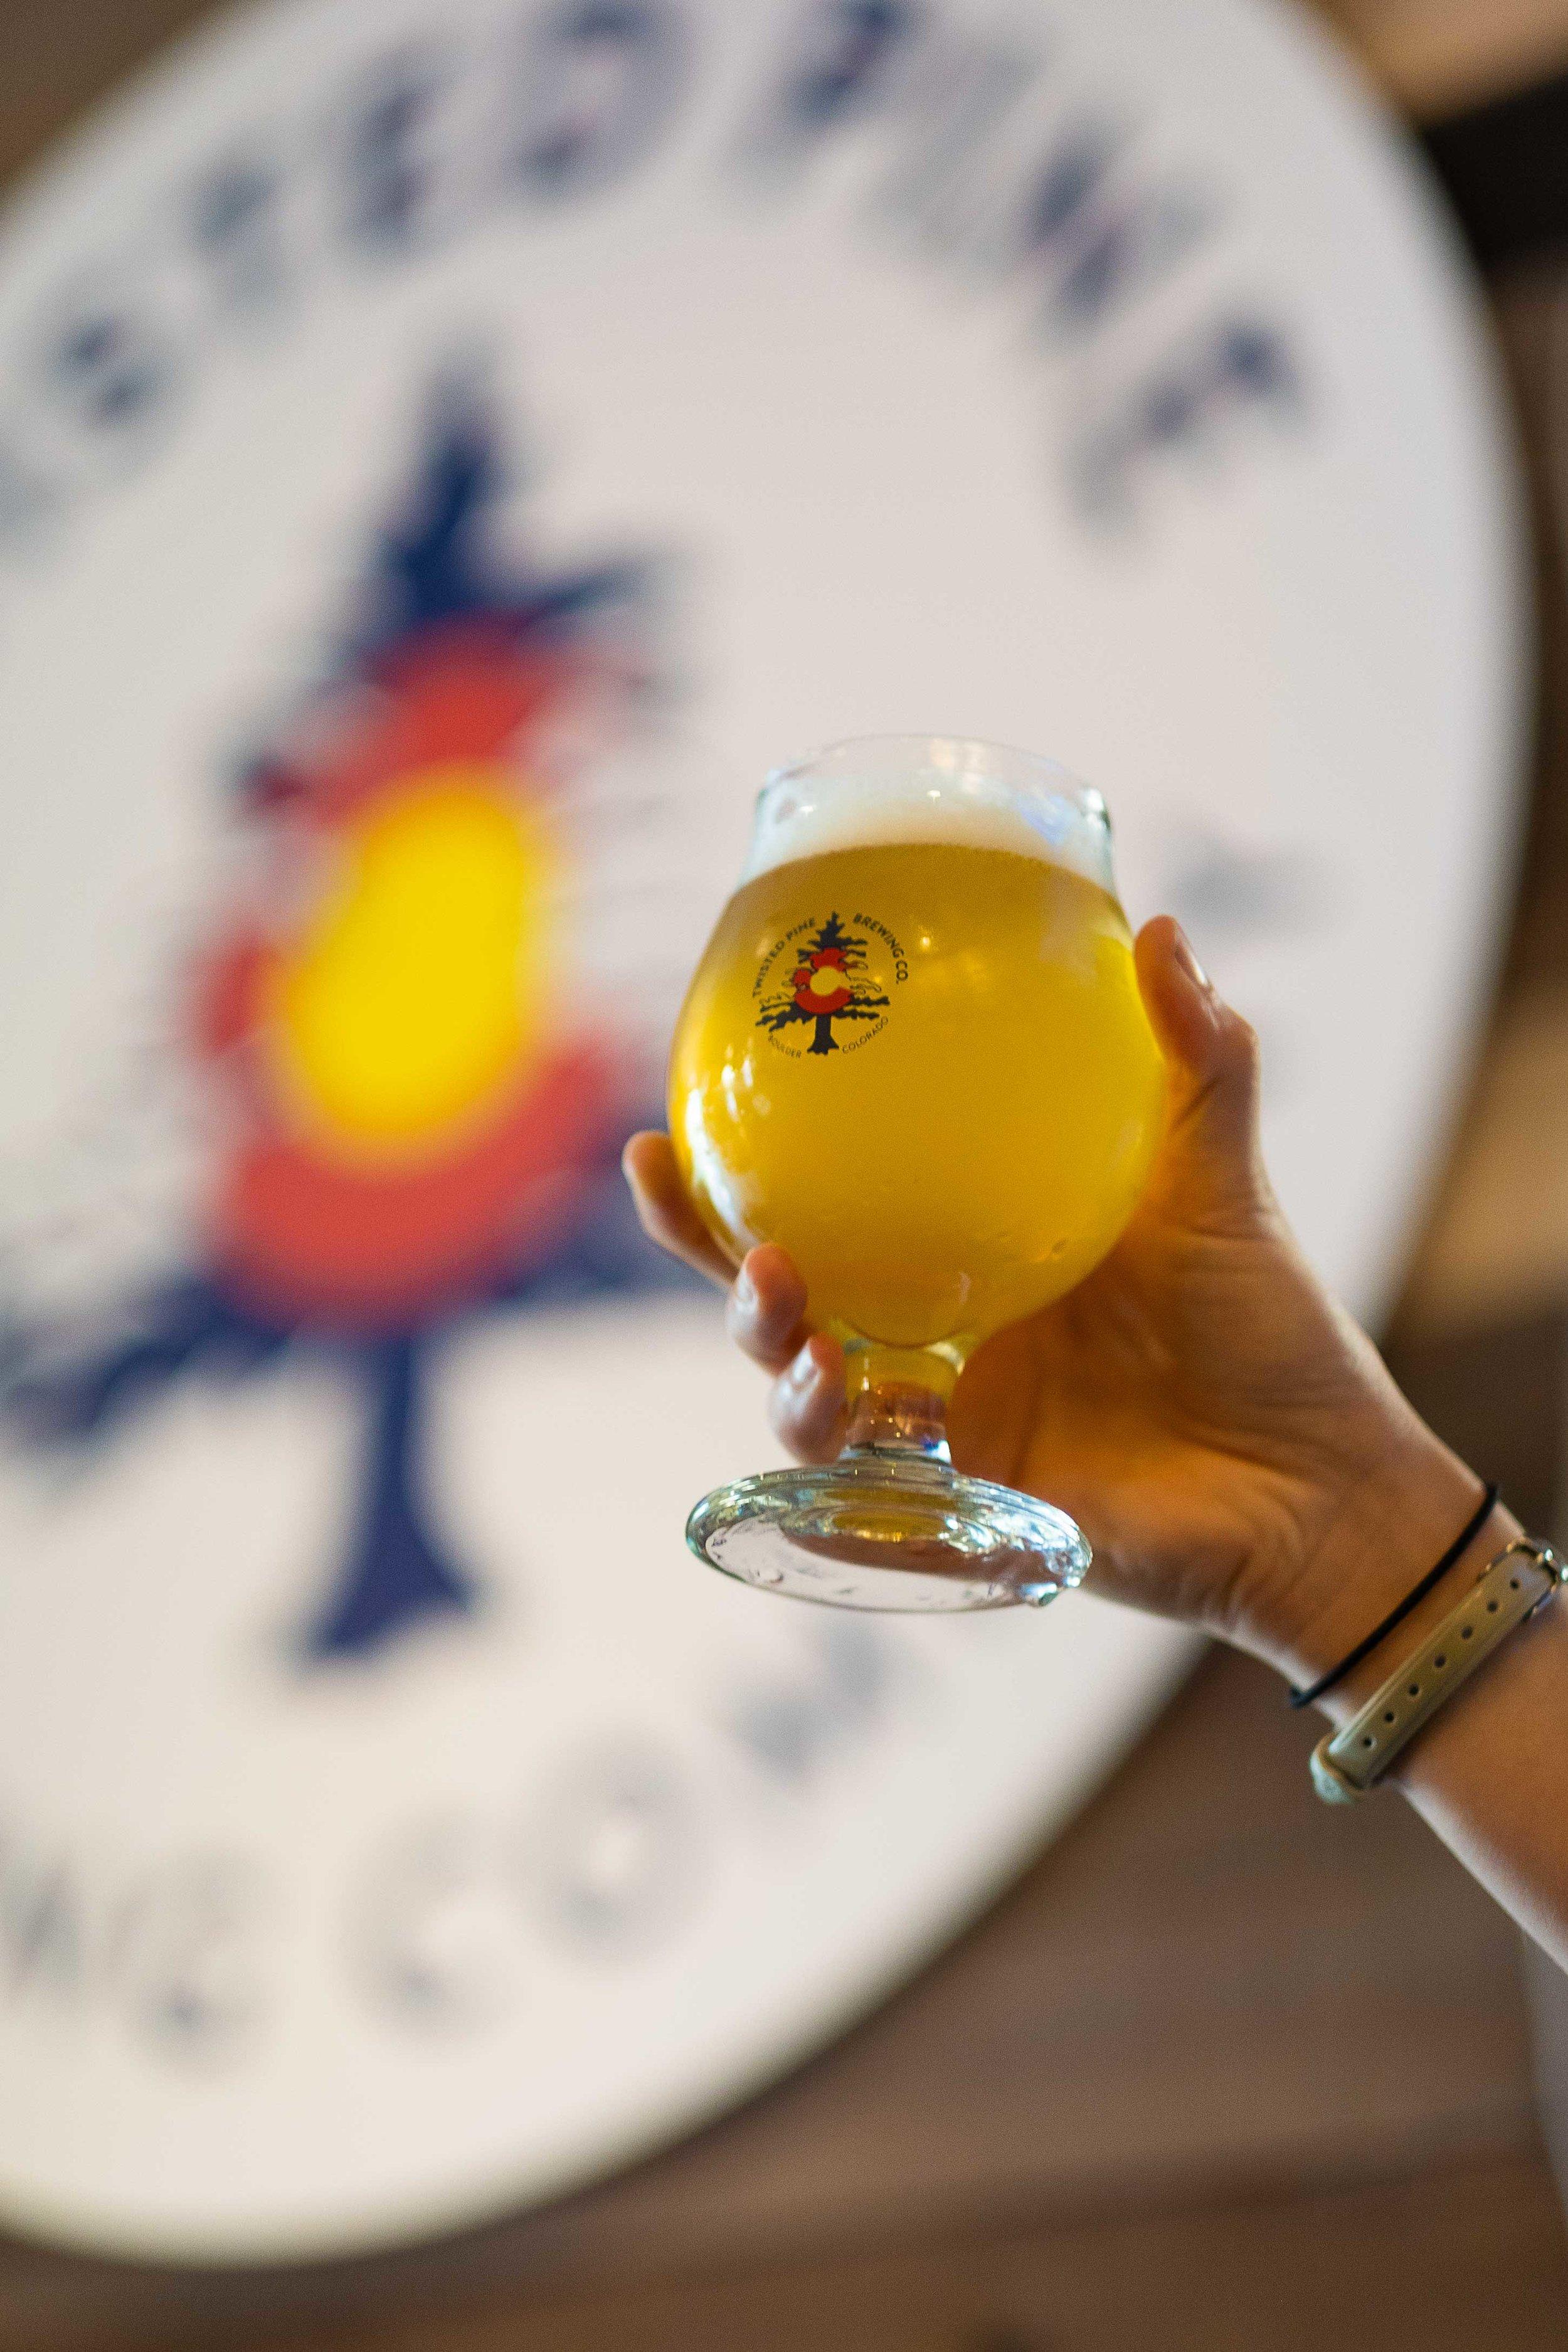 Cheers to gluten-reduced beer!